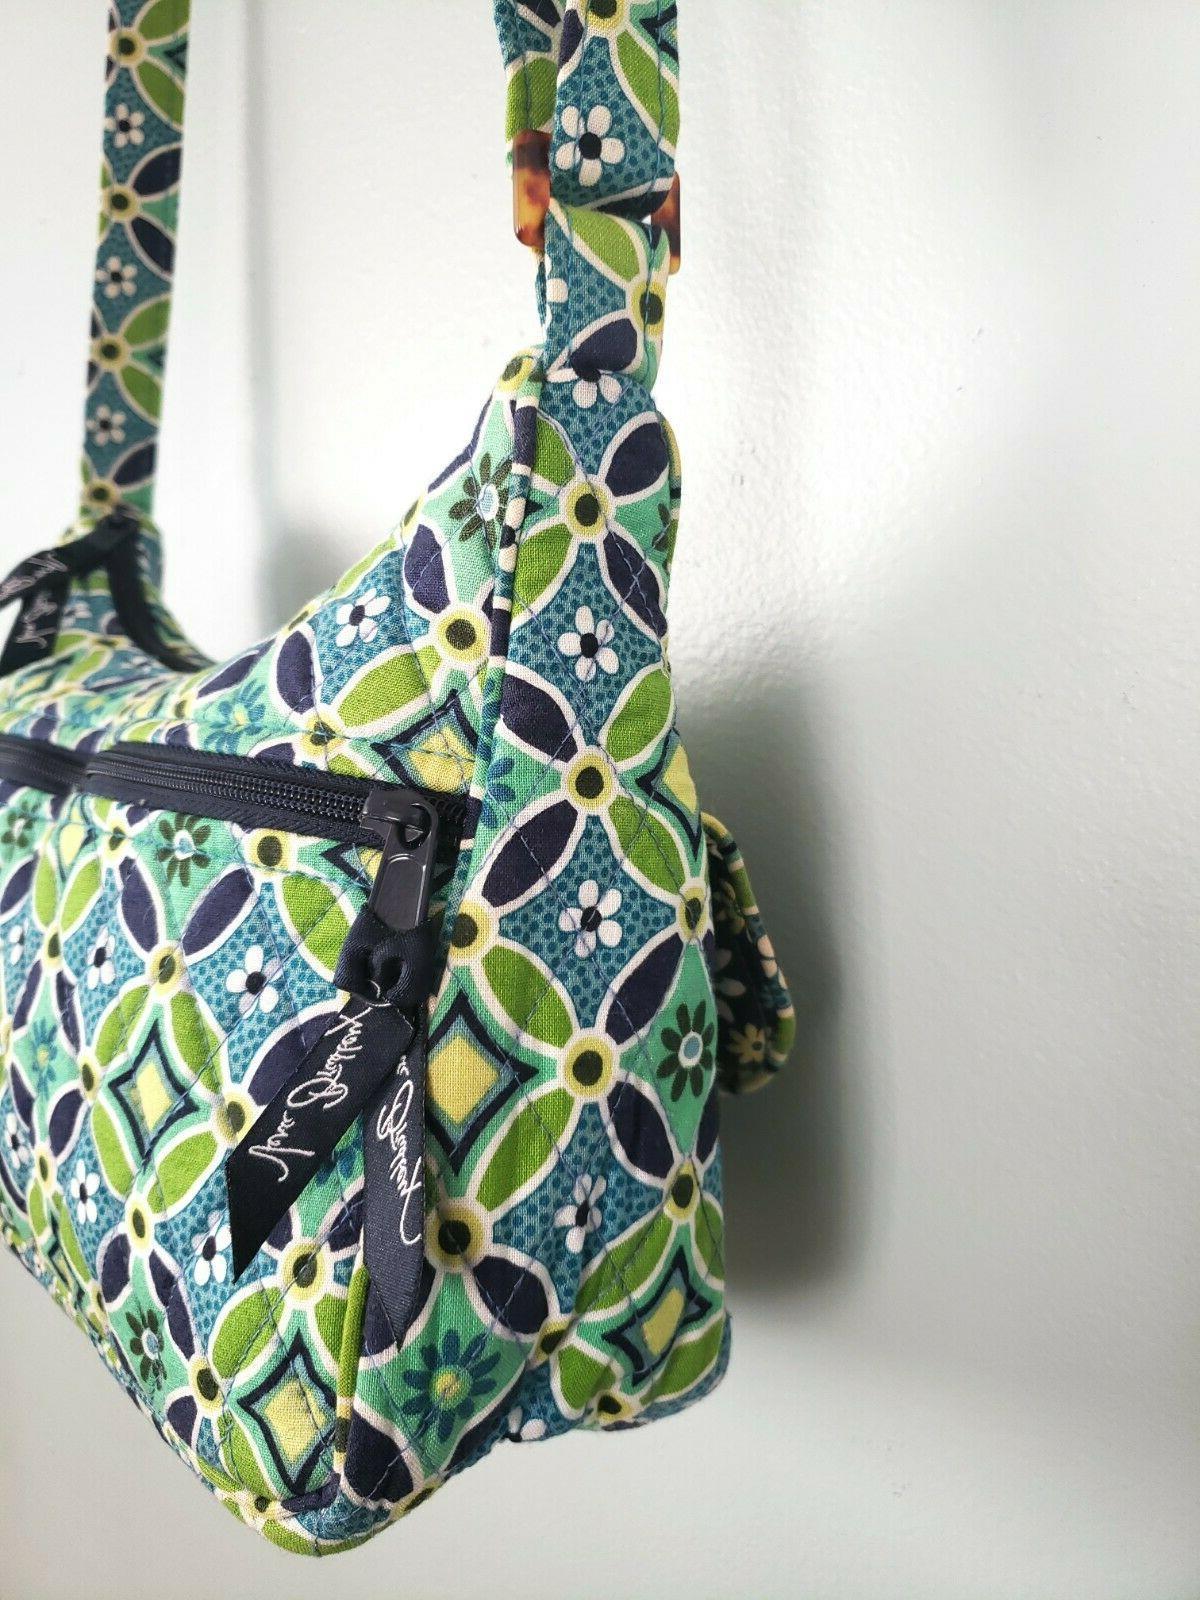 Vera Blue & Green Daisy' Bag and Shoulder -